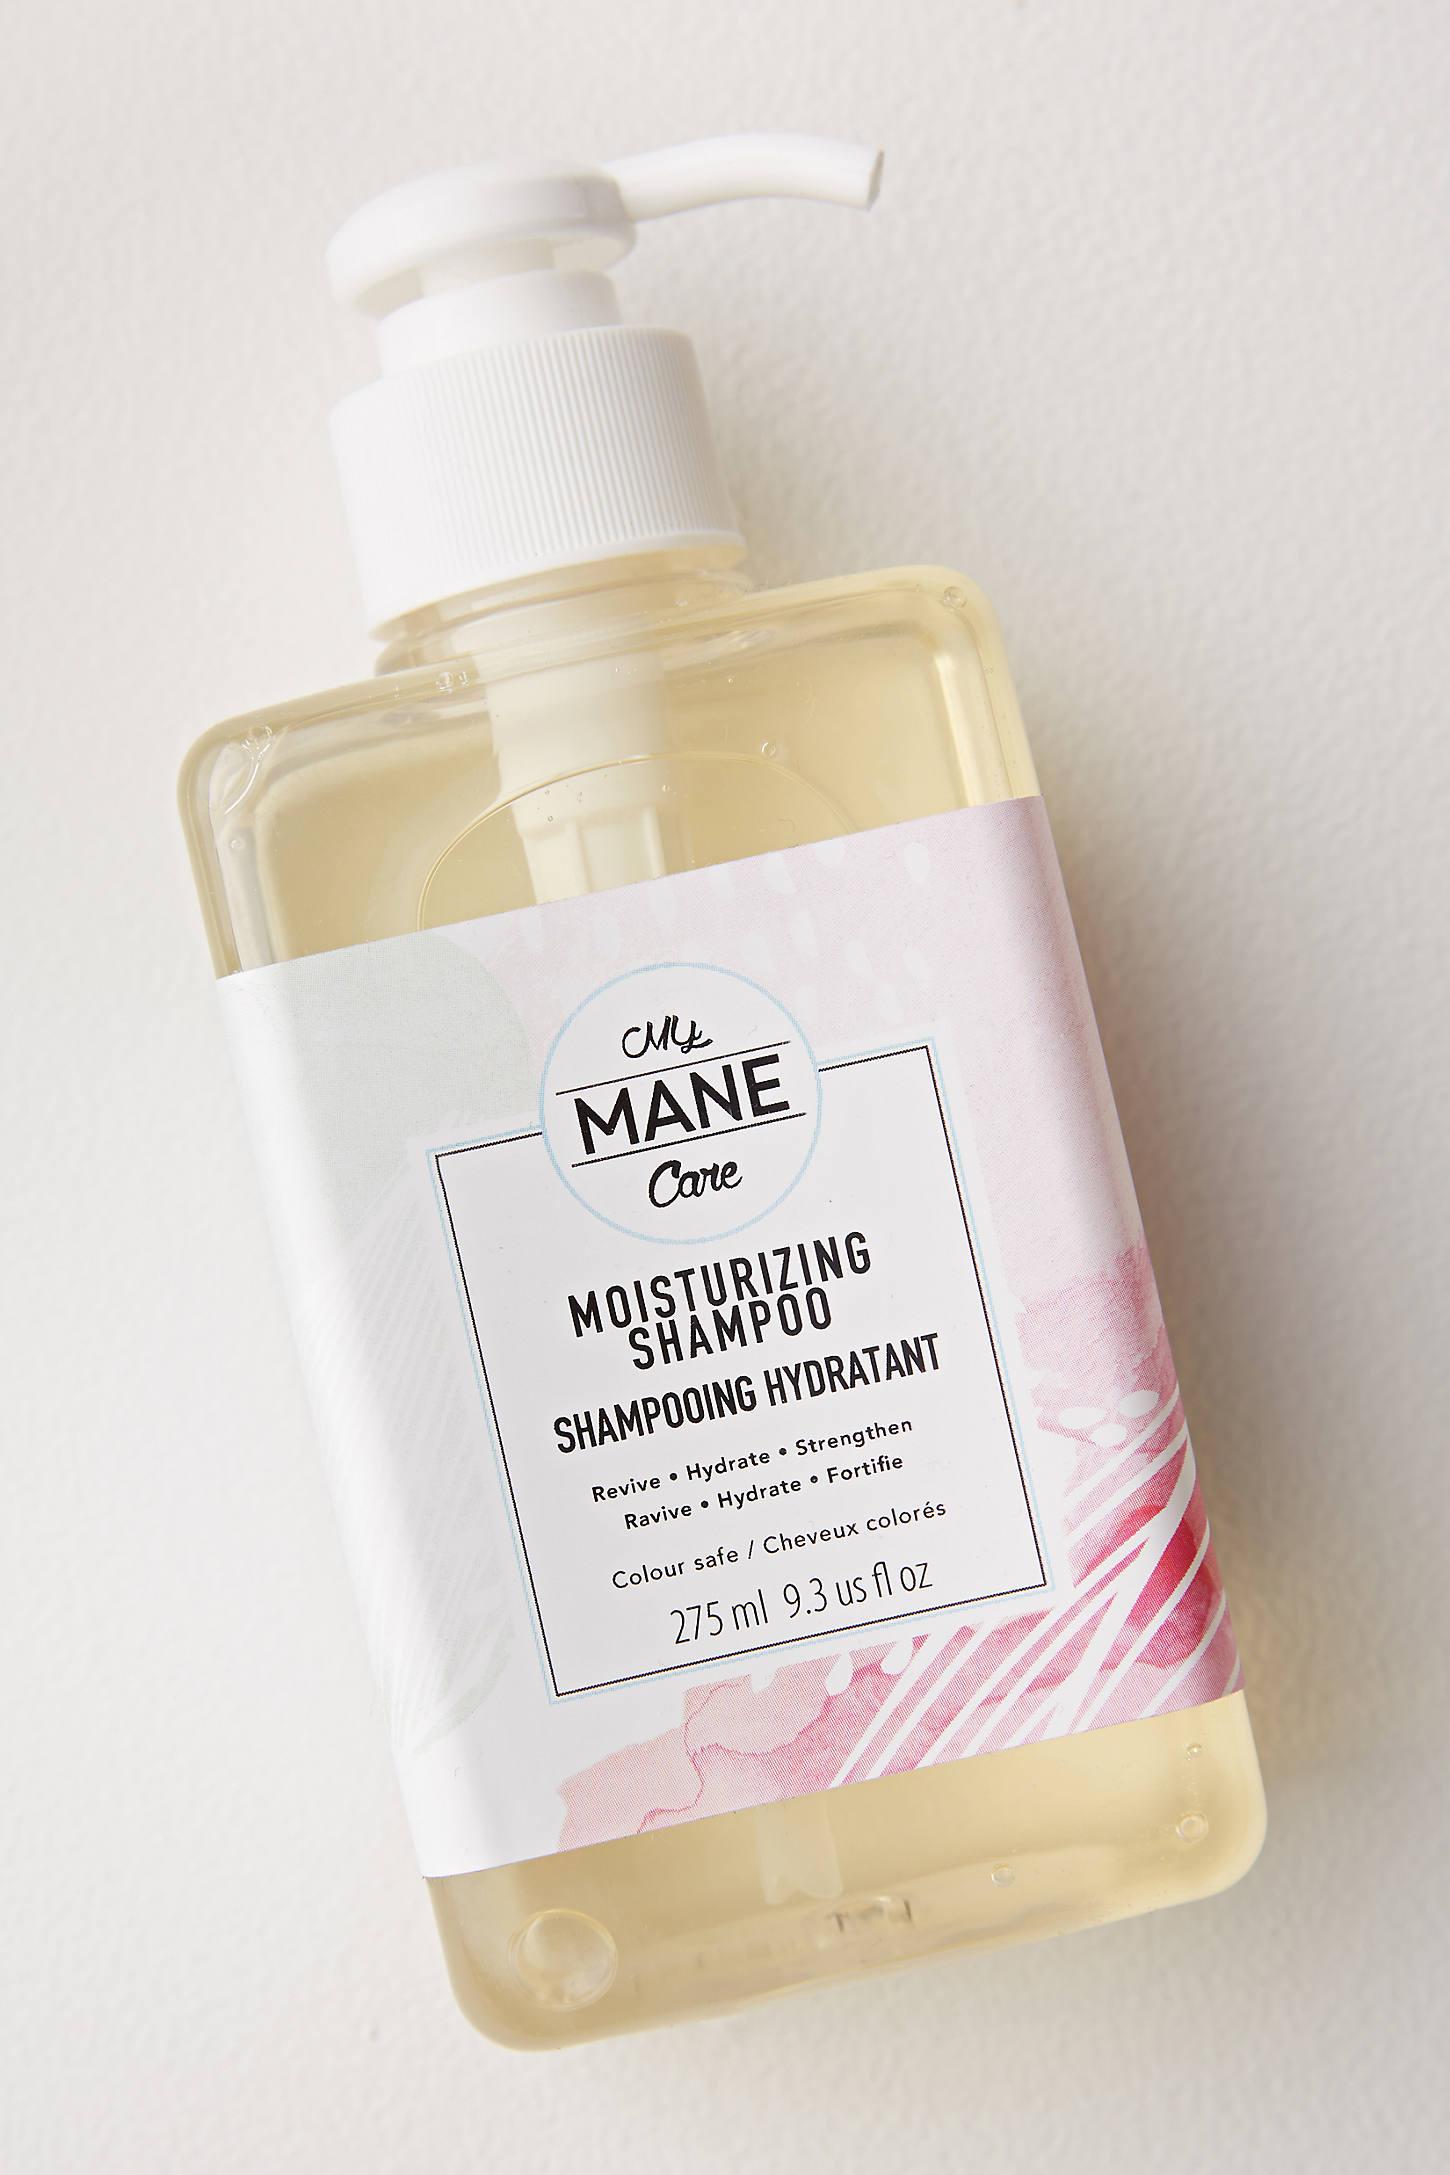 My Mane Care Moisturizing Shampoo